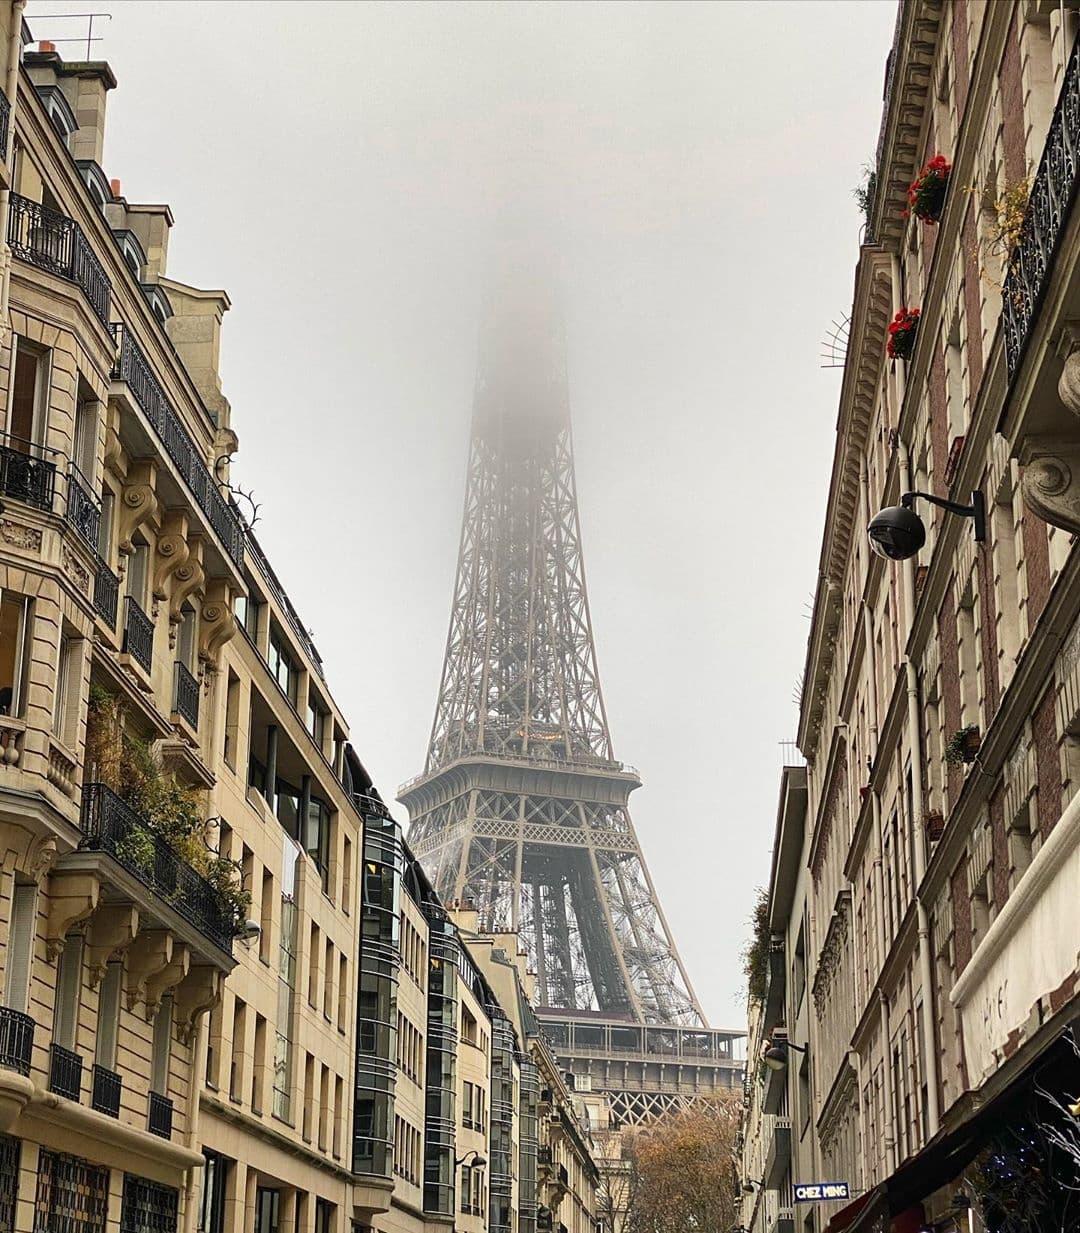 Foggy Eiffel Tower on Rue de Montessuy